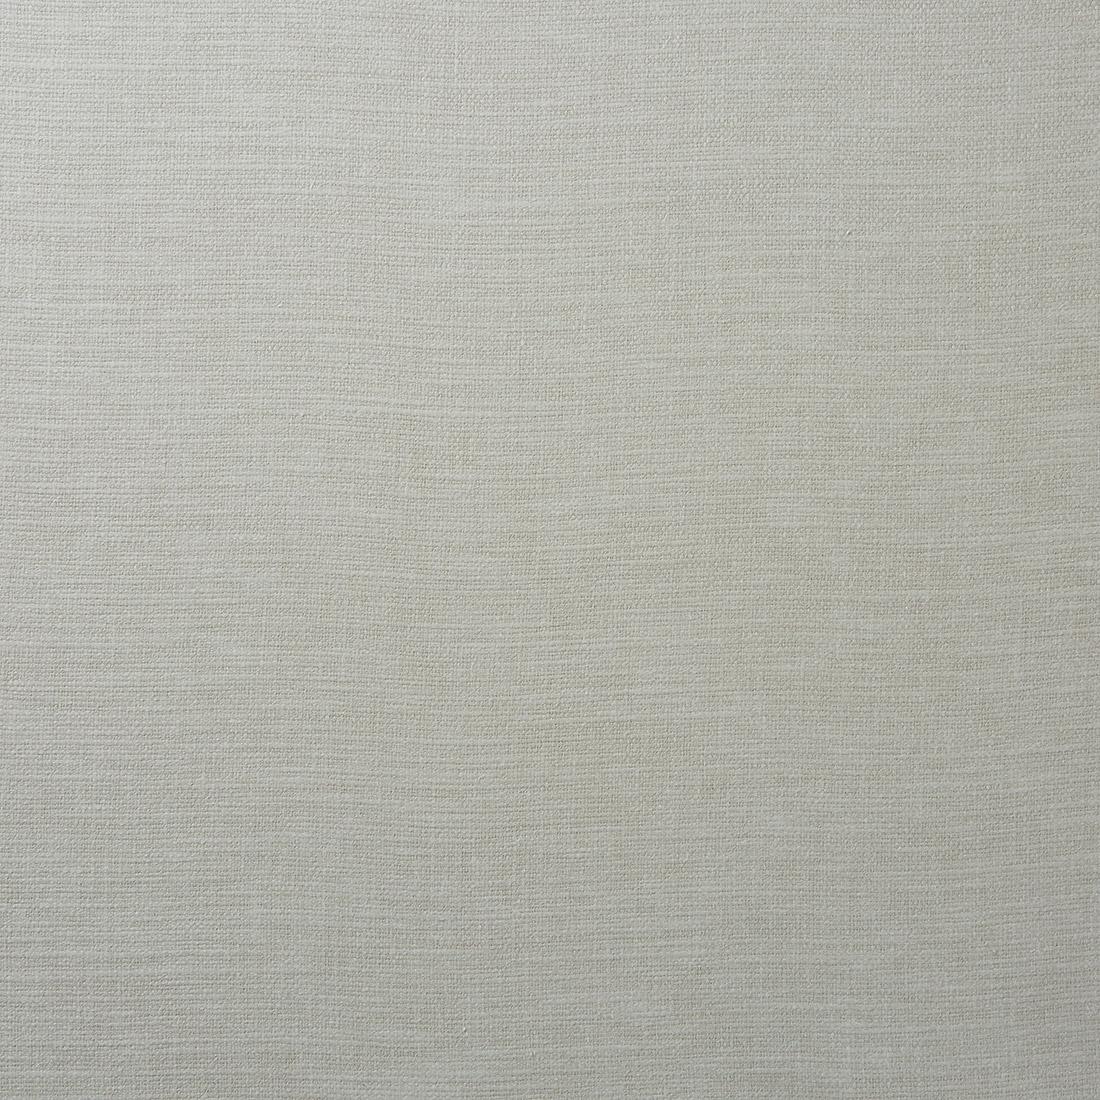 Lunar Ecru Upholstery Fabric